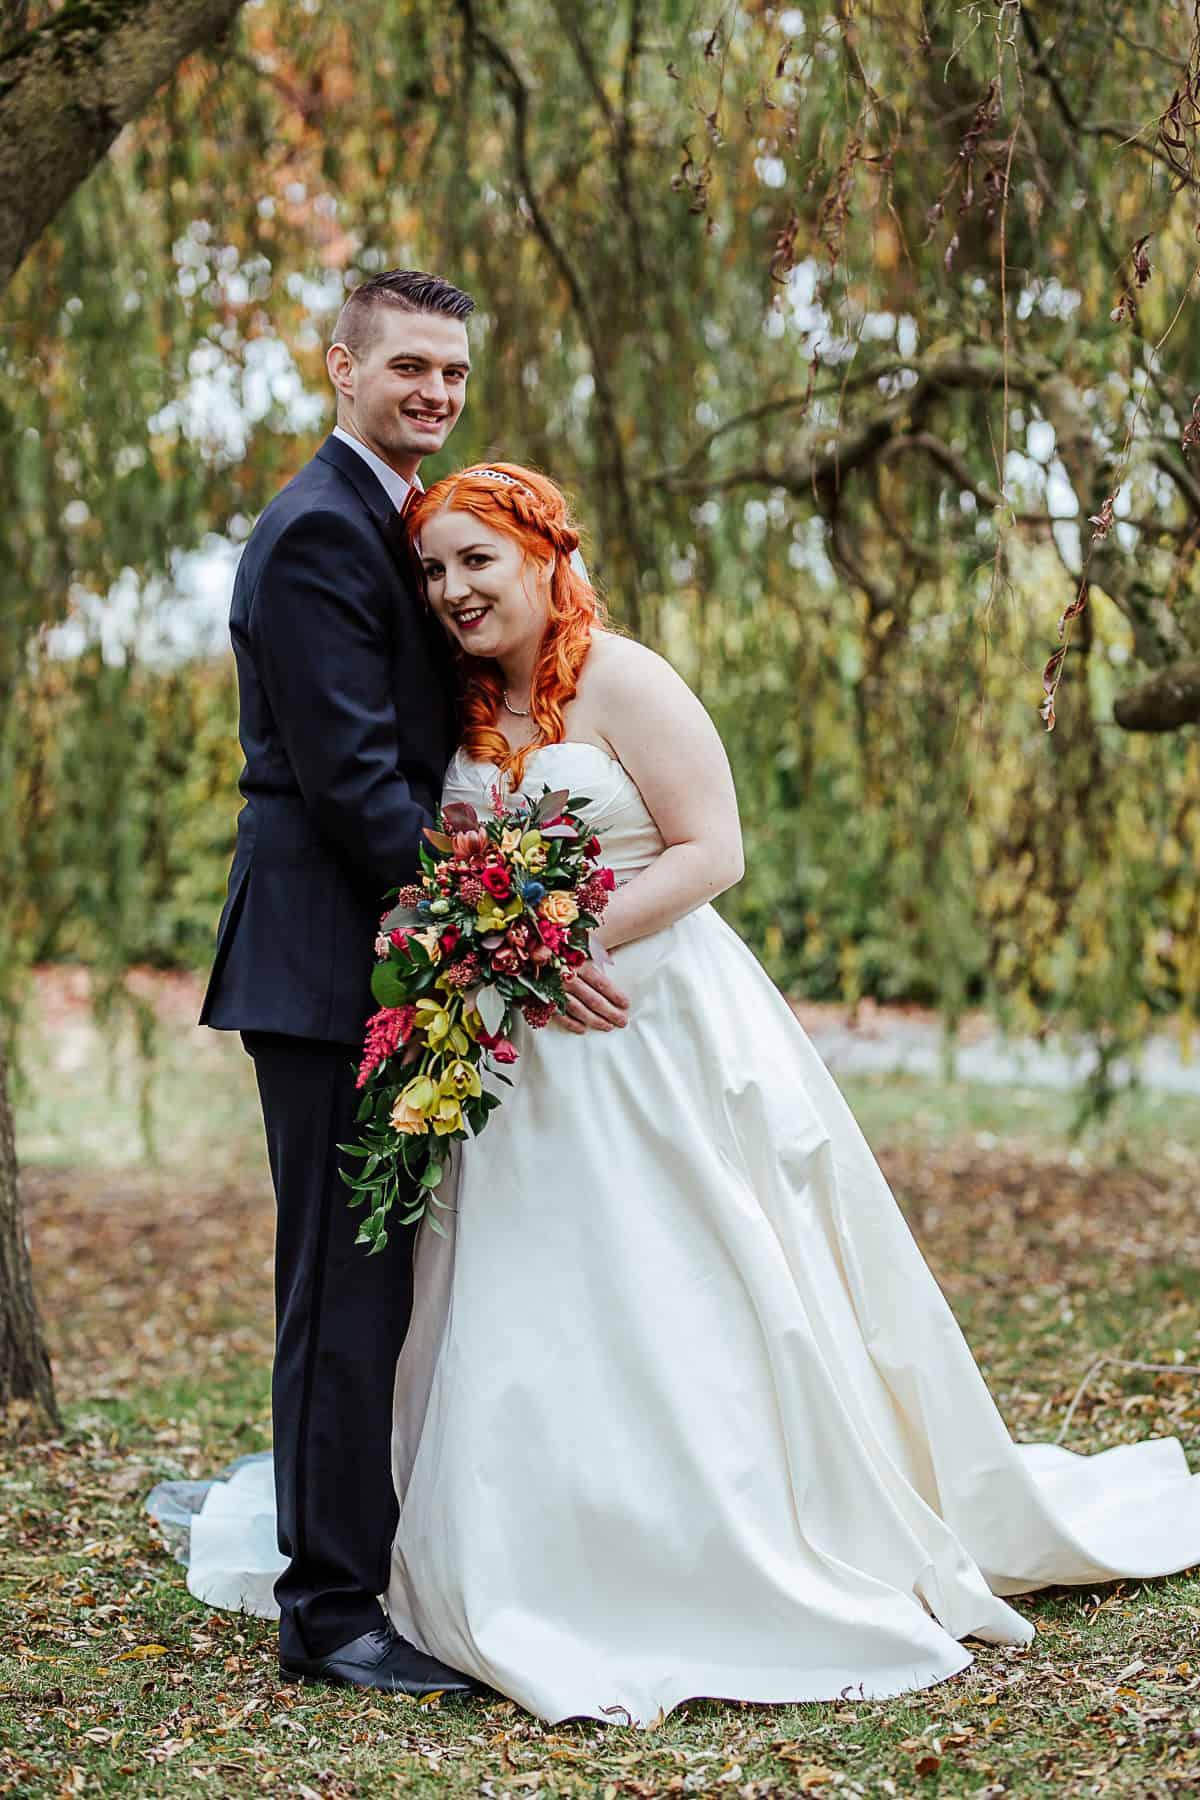 barberstown castle wedding portrait of bride and groom